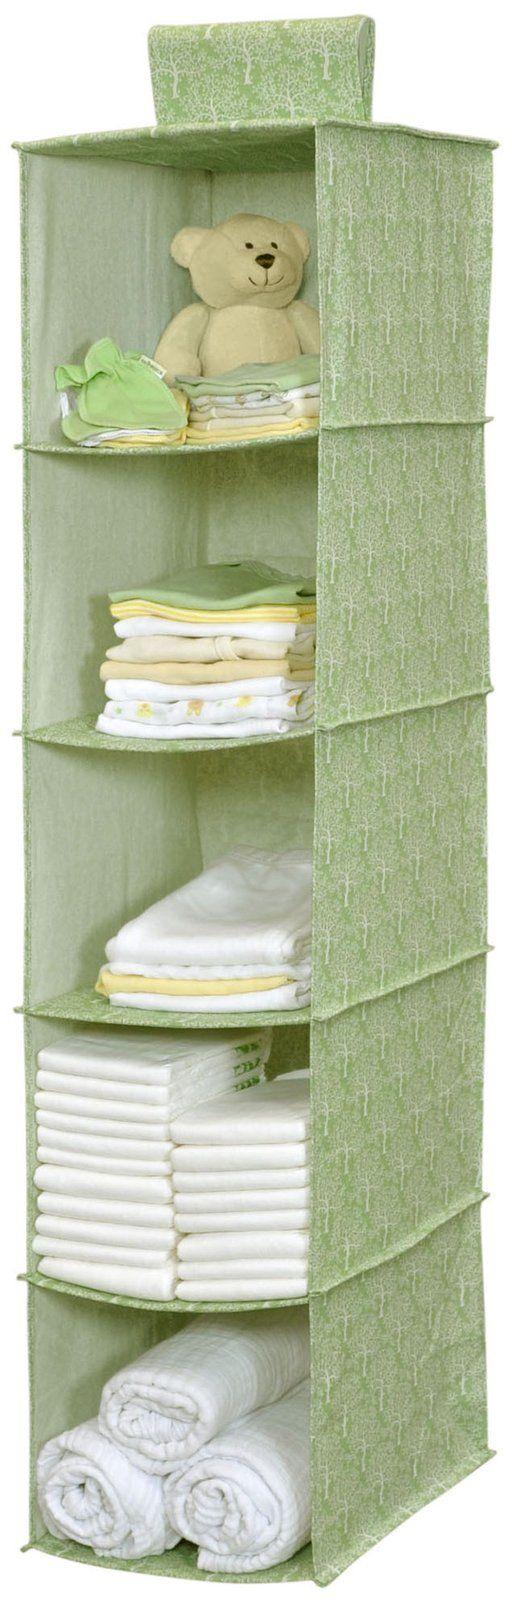 Crib organizer babies r us - Cribs